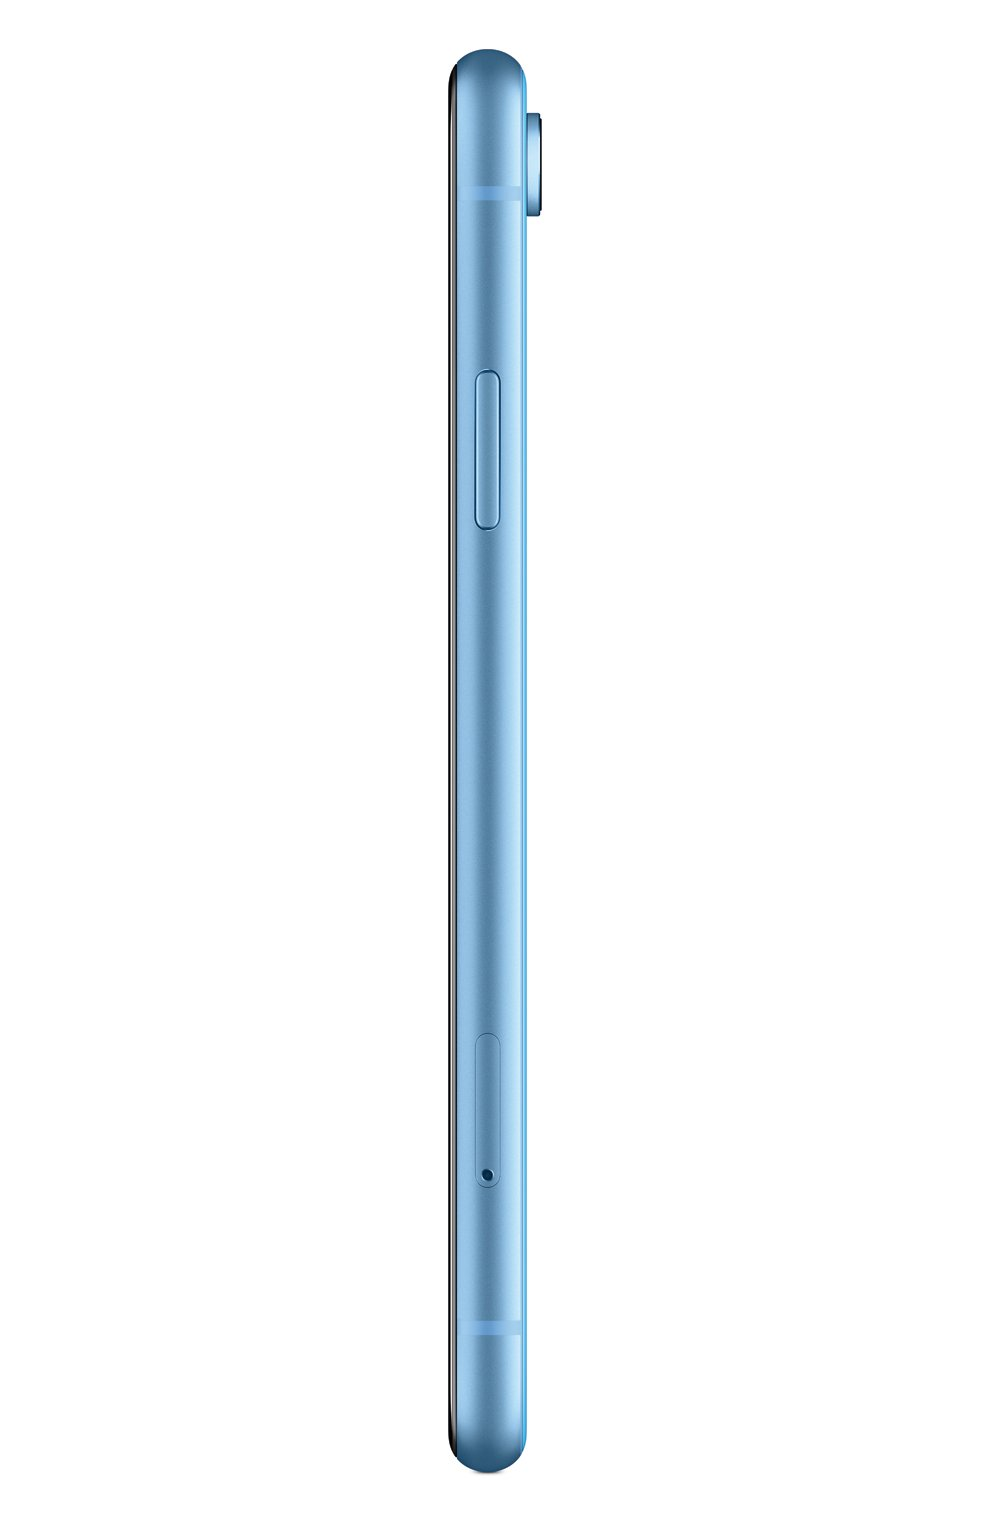 iPhone XR 64GB Blue Apple blue | Фото №4